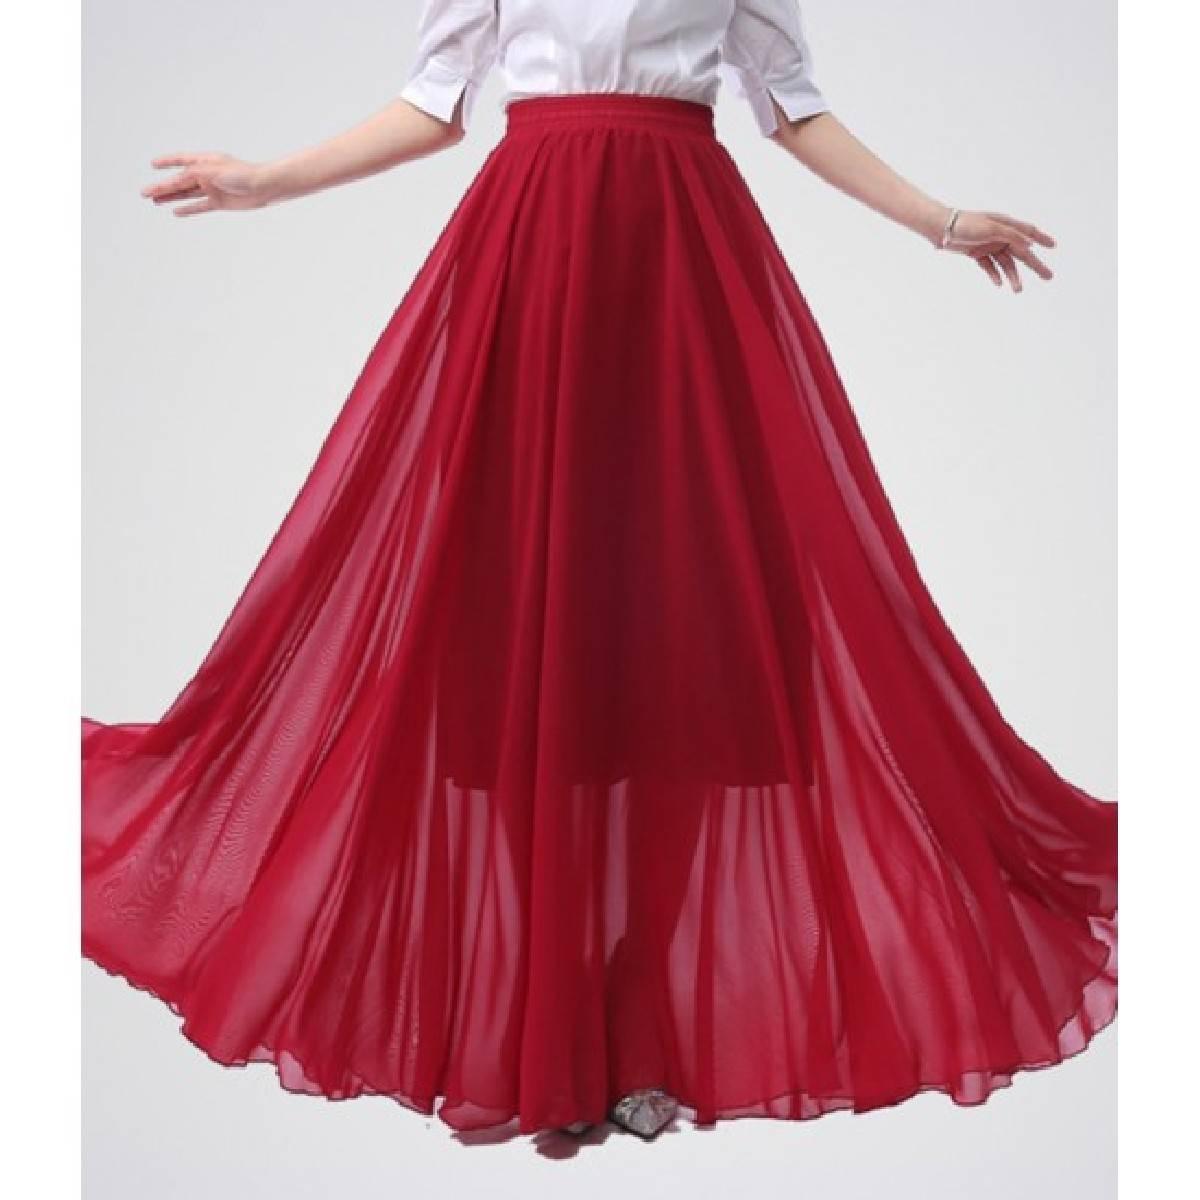 Fashion up chiffon pleated long skirts for women, long chiffon skirts ,long pleated skirts for women,summer skirts for ladies, stylish skirts for ladies, party skirts for women wedding skirts for women, maxi skirts